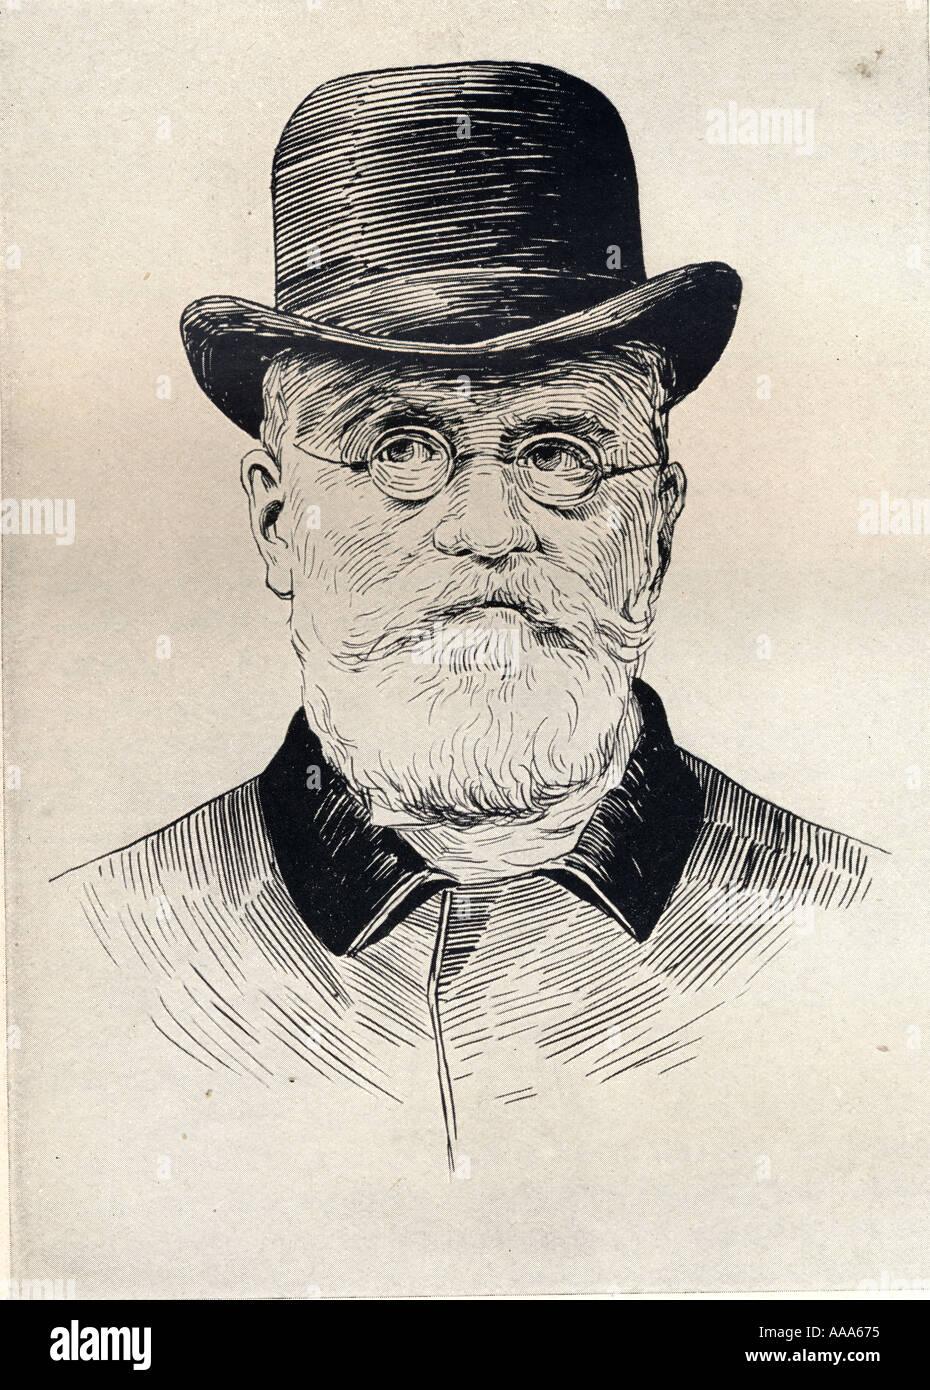 Karl Friedrich August Ferdinand Julius von Holstein, aka la eminencia gris del Ministerio de Relaciones Exteriores alemán, 1837 - 1909. Foto de stock